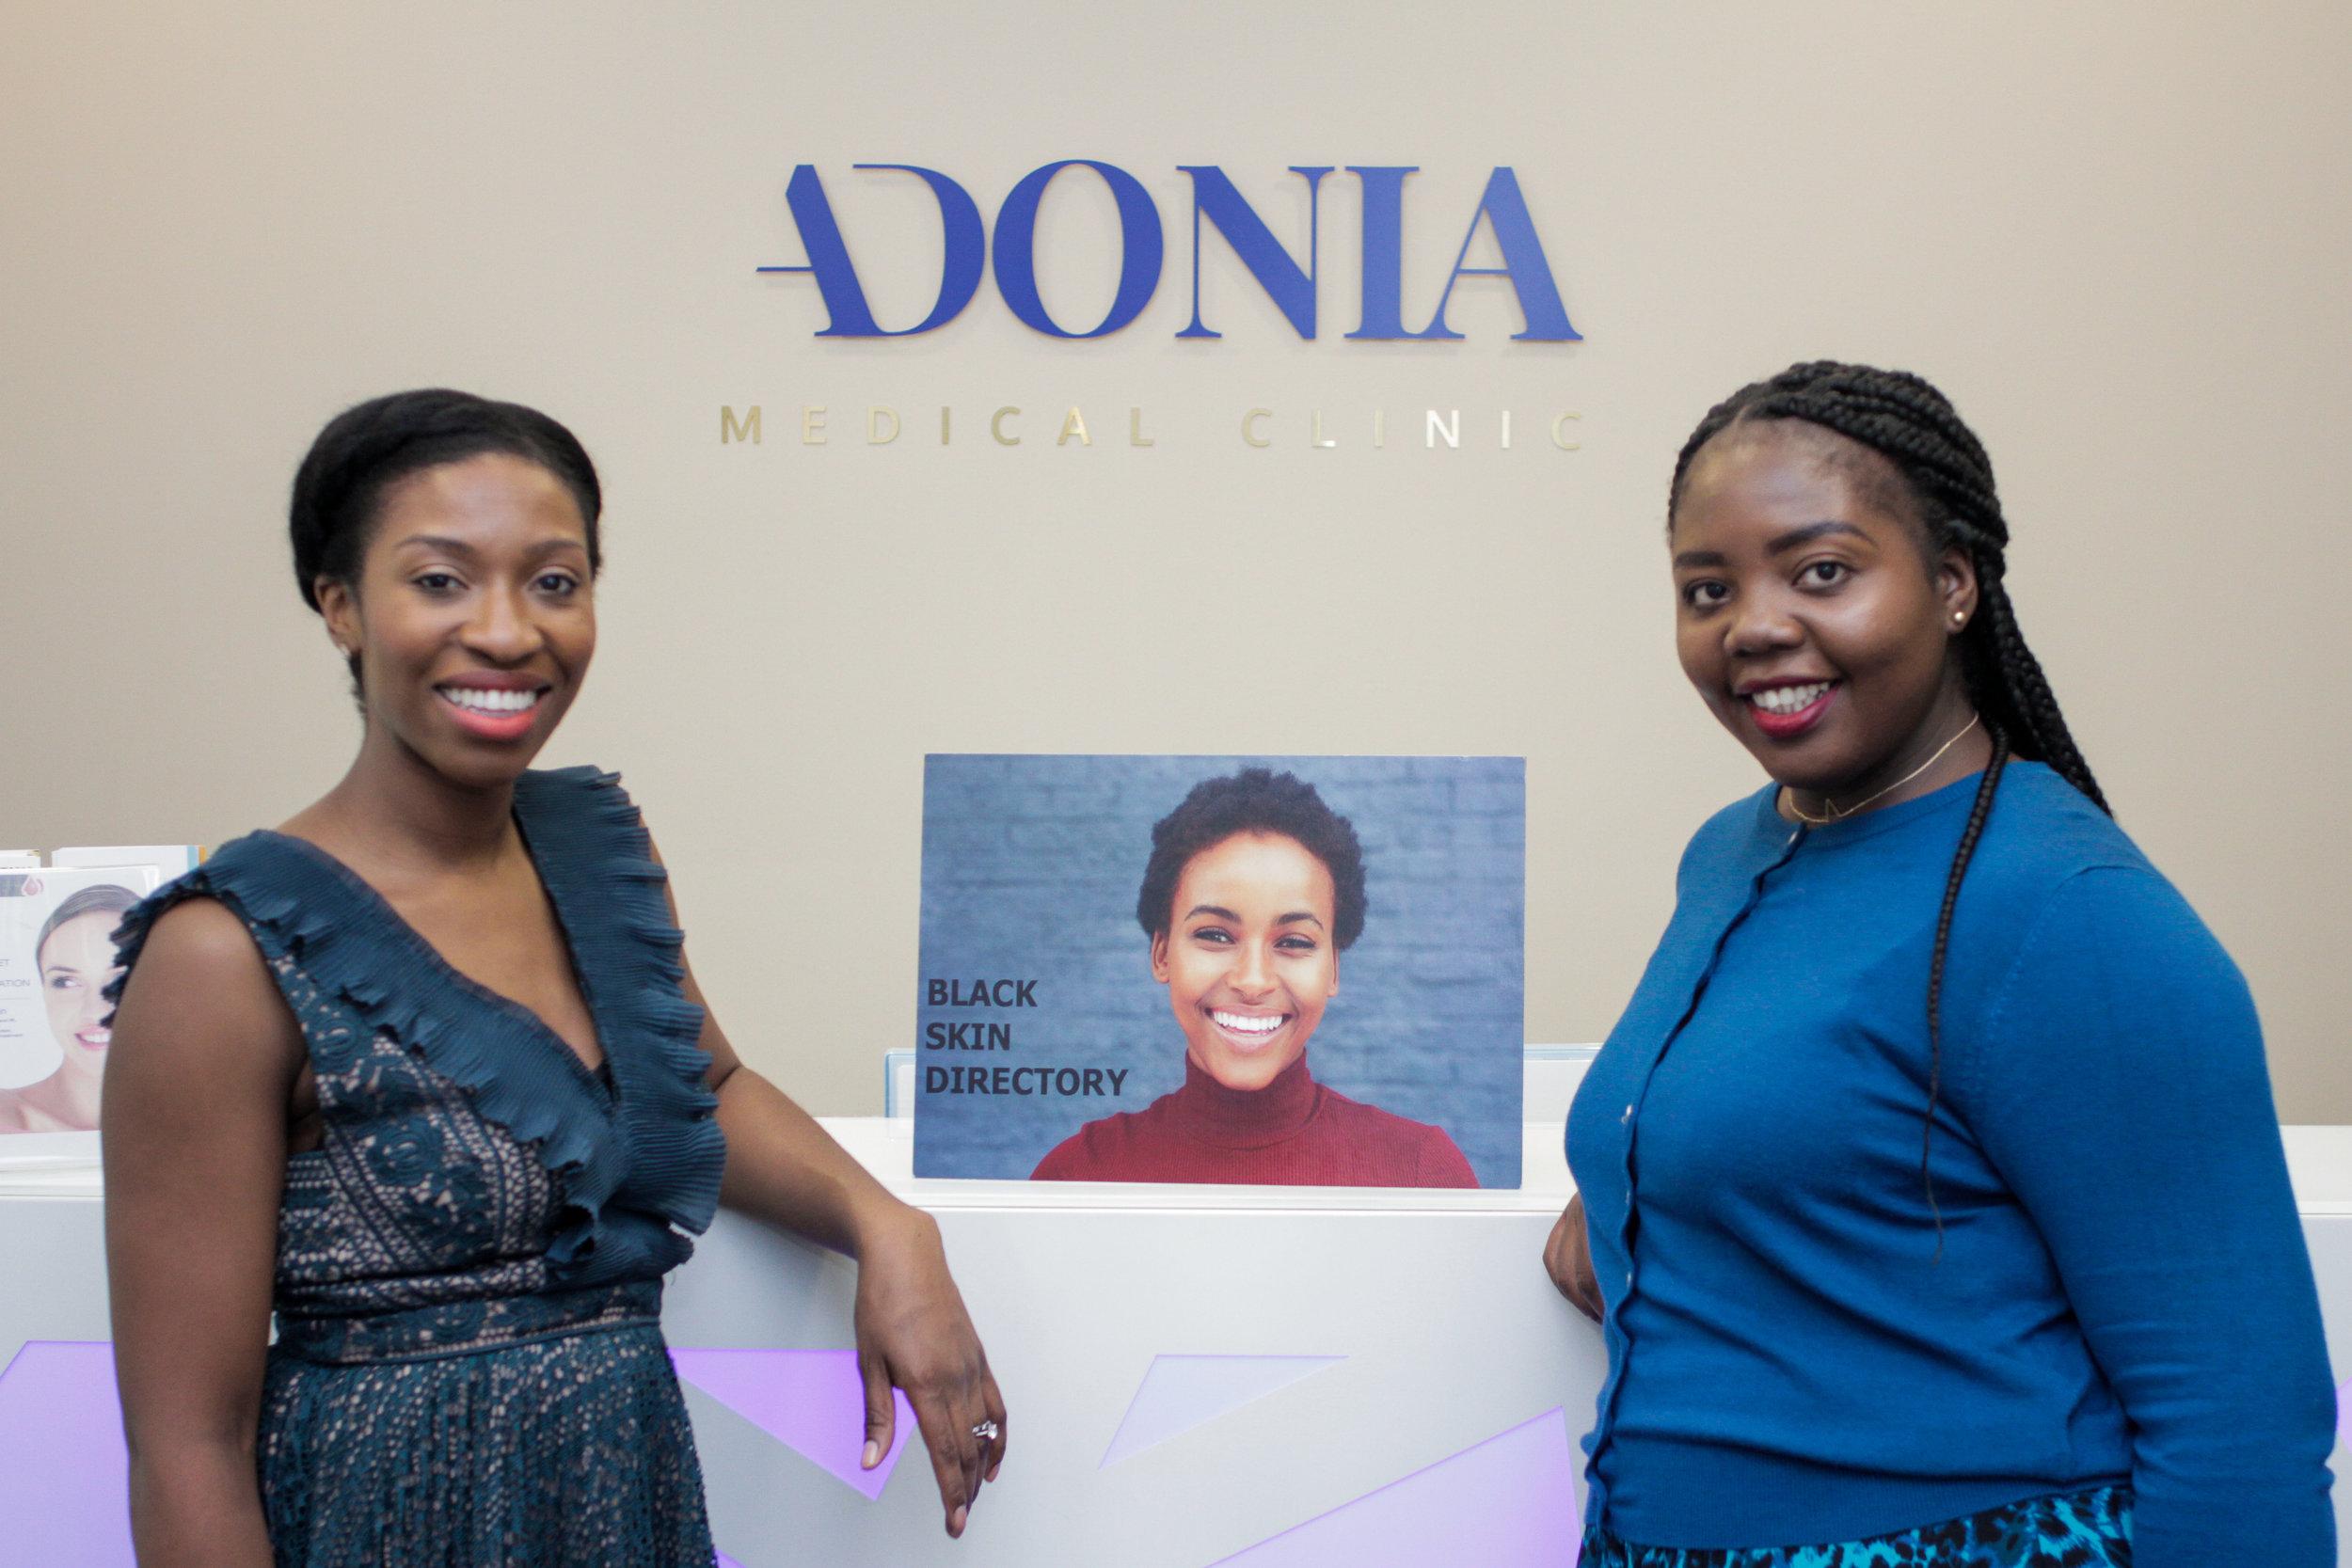 Clinical Director of Adonia Medical - Dr Ifeoma Ekijeme and Founder of Black Skin Director - Dija Ayodele